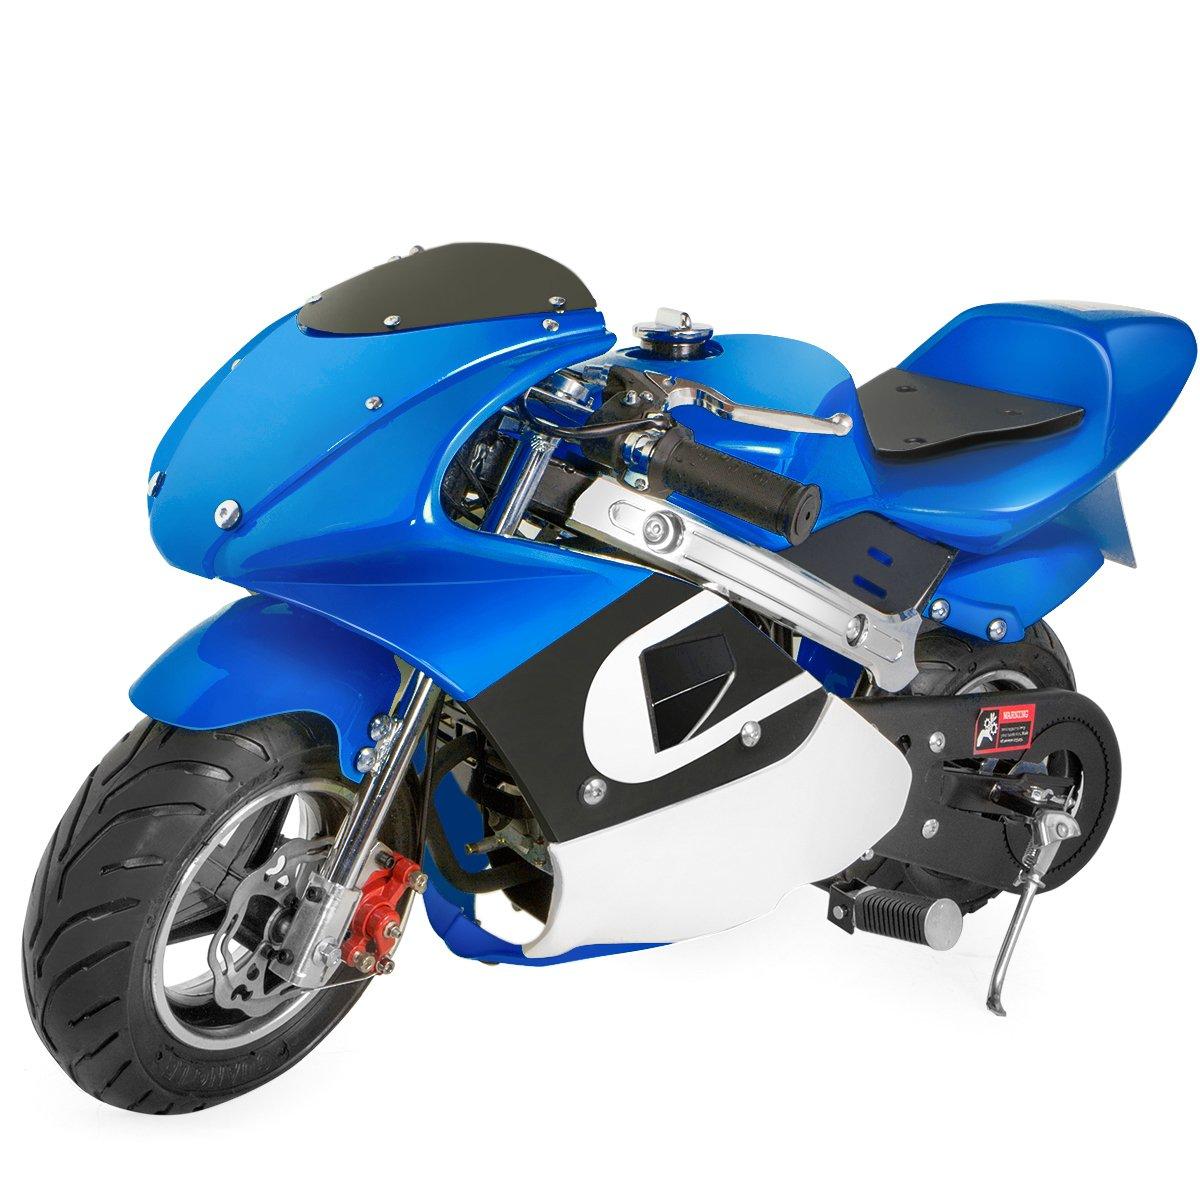 XtremepowerUS Gas Pocket BikeBlack Friday Deals 2019